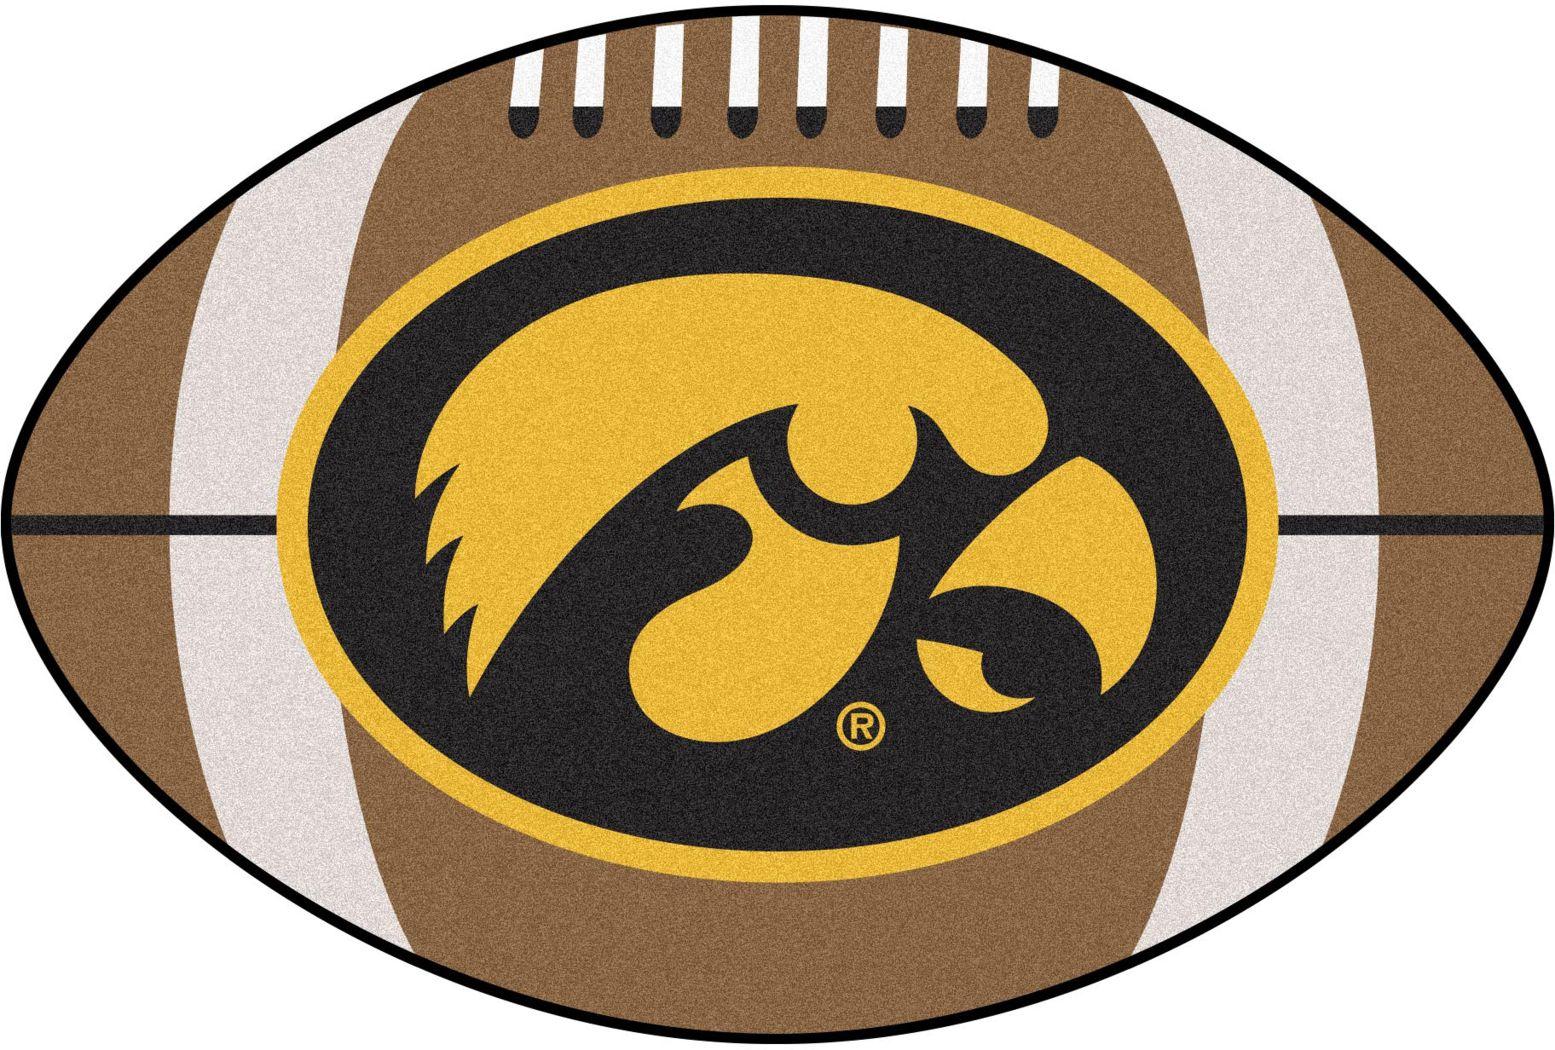 "NCAA Football Mascot University of Iowa 1'6"" x 1'10"" Rug"